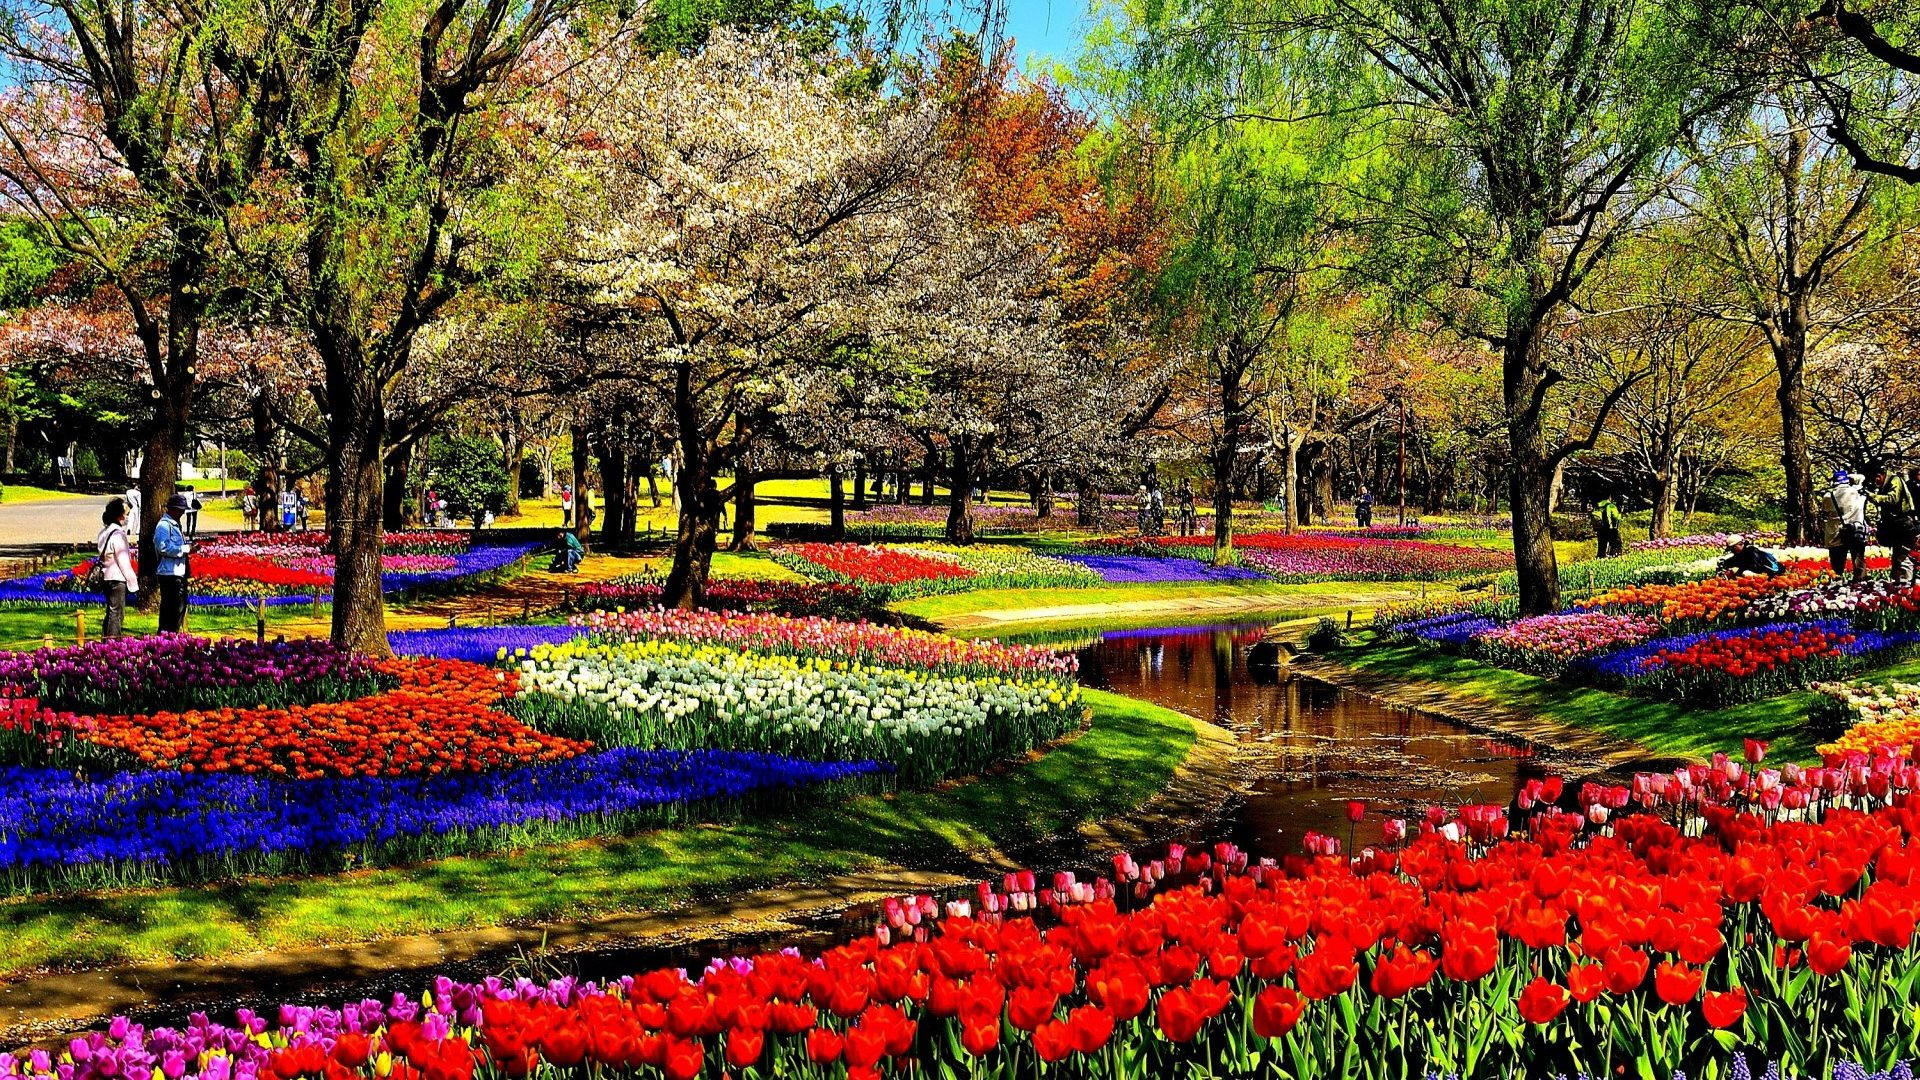 Free photo: Garden of Flowers - Nature, Tulip, Garden - Free ...